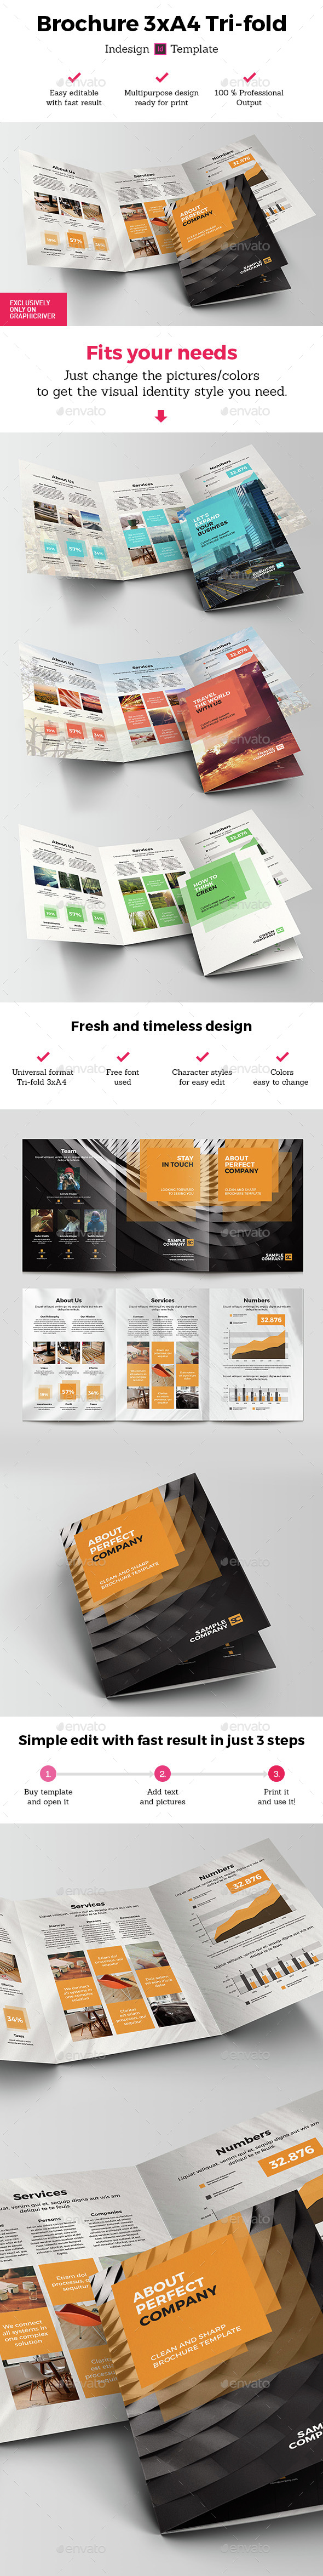 Brochure 3xA4 Tri-fold Indesign Template  - Brochures Print Templates